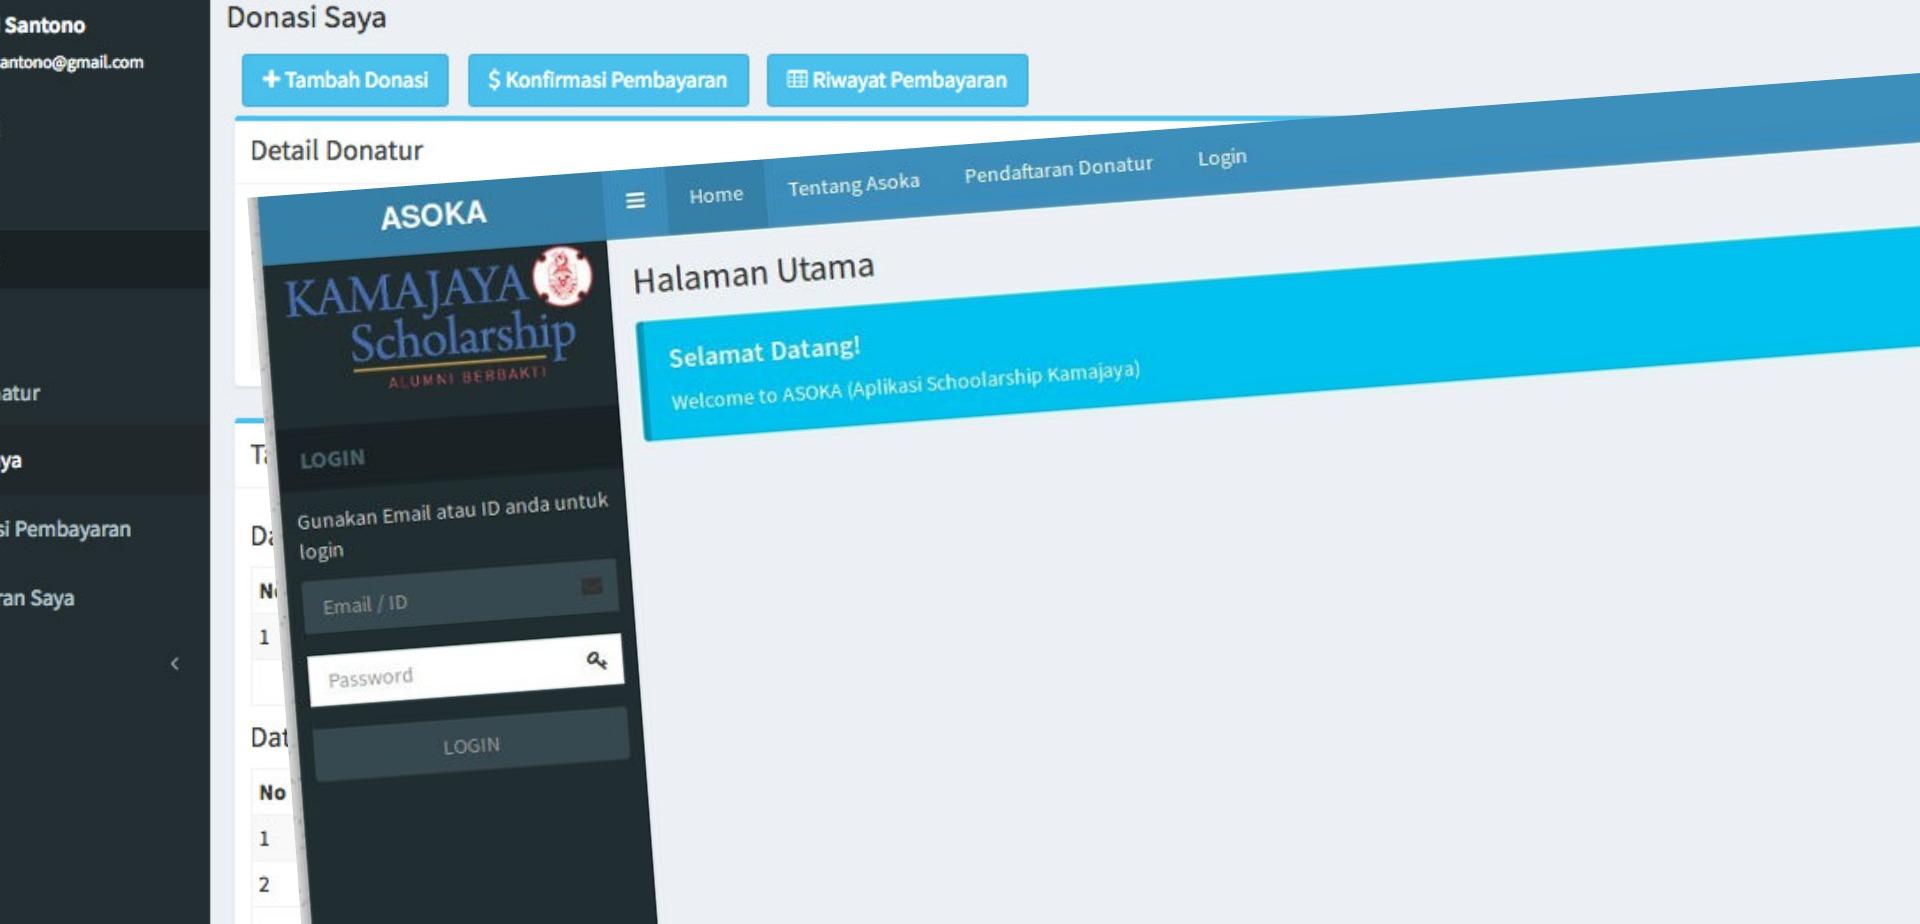 Peluncuran Aplikasi Scholarship Kamajaya